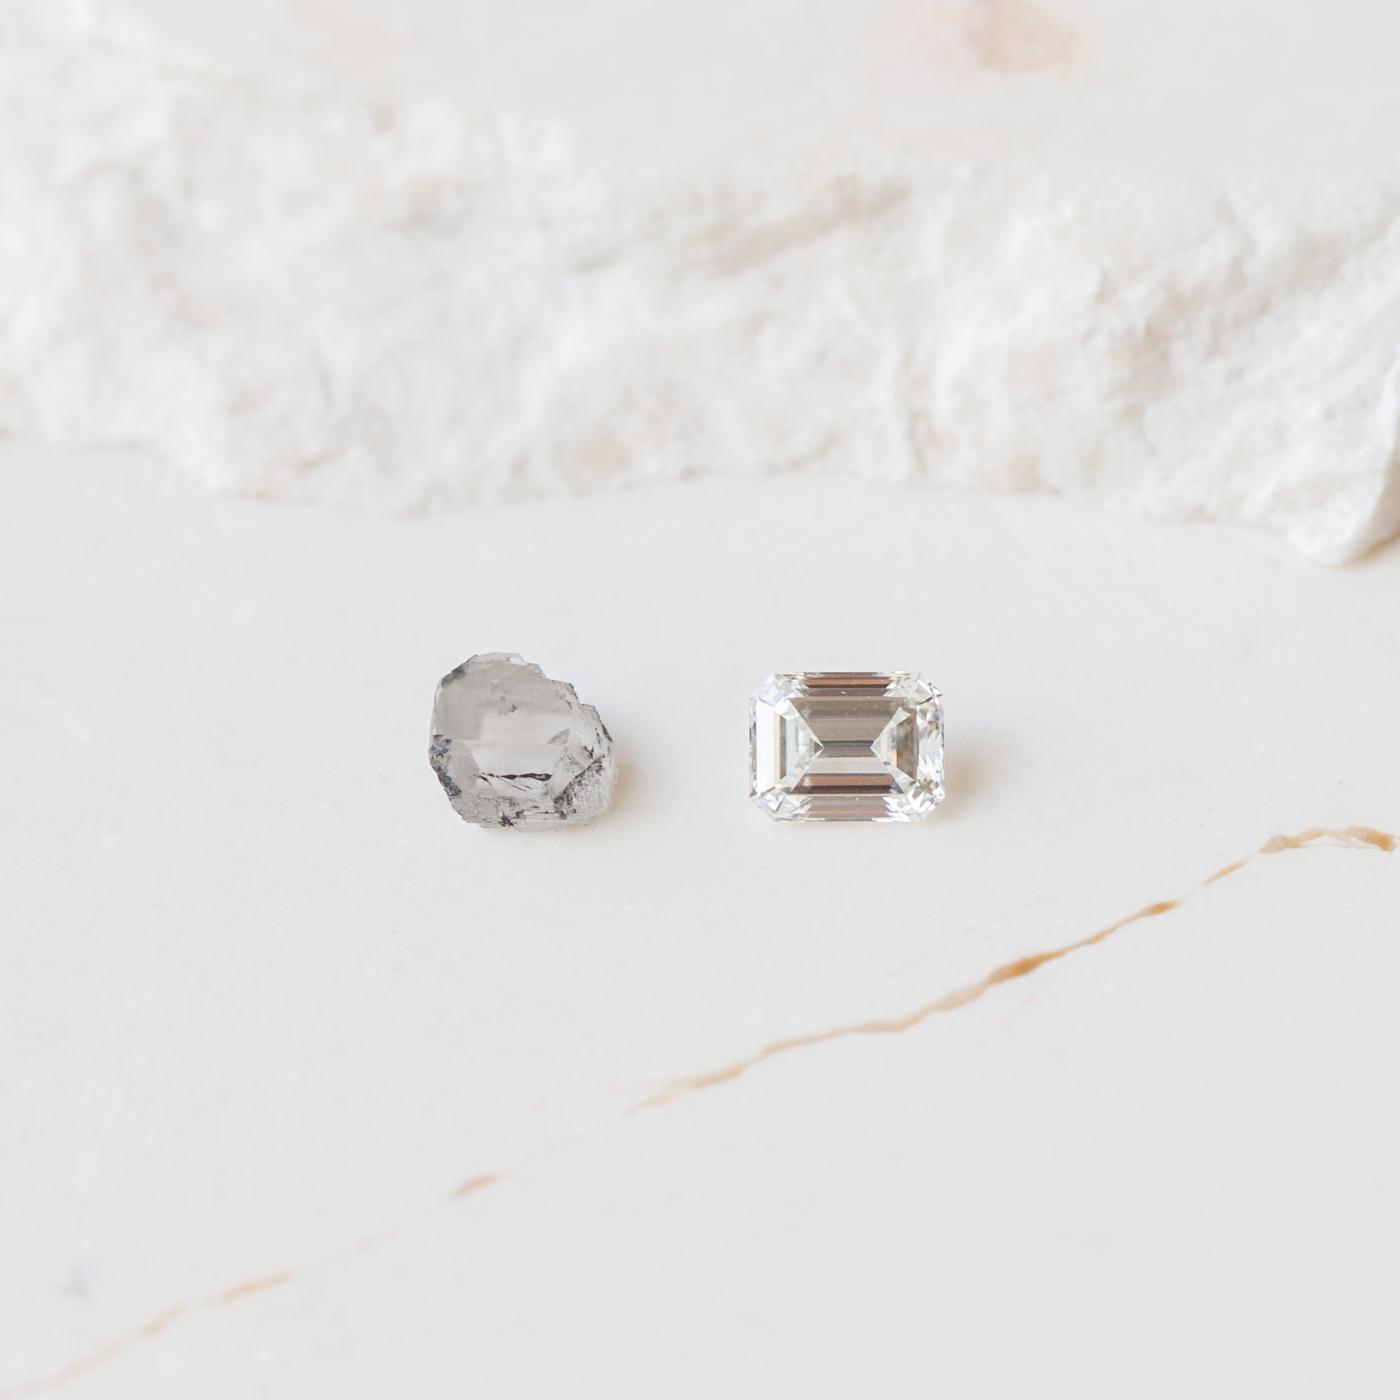 Introducing Carbon Neutral Diamonds